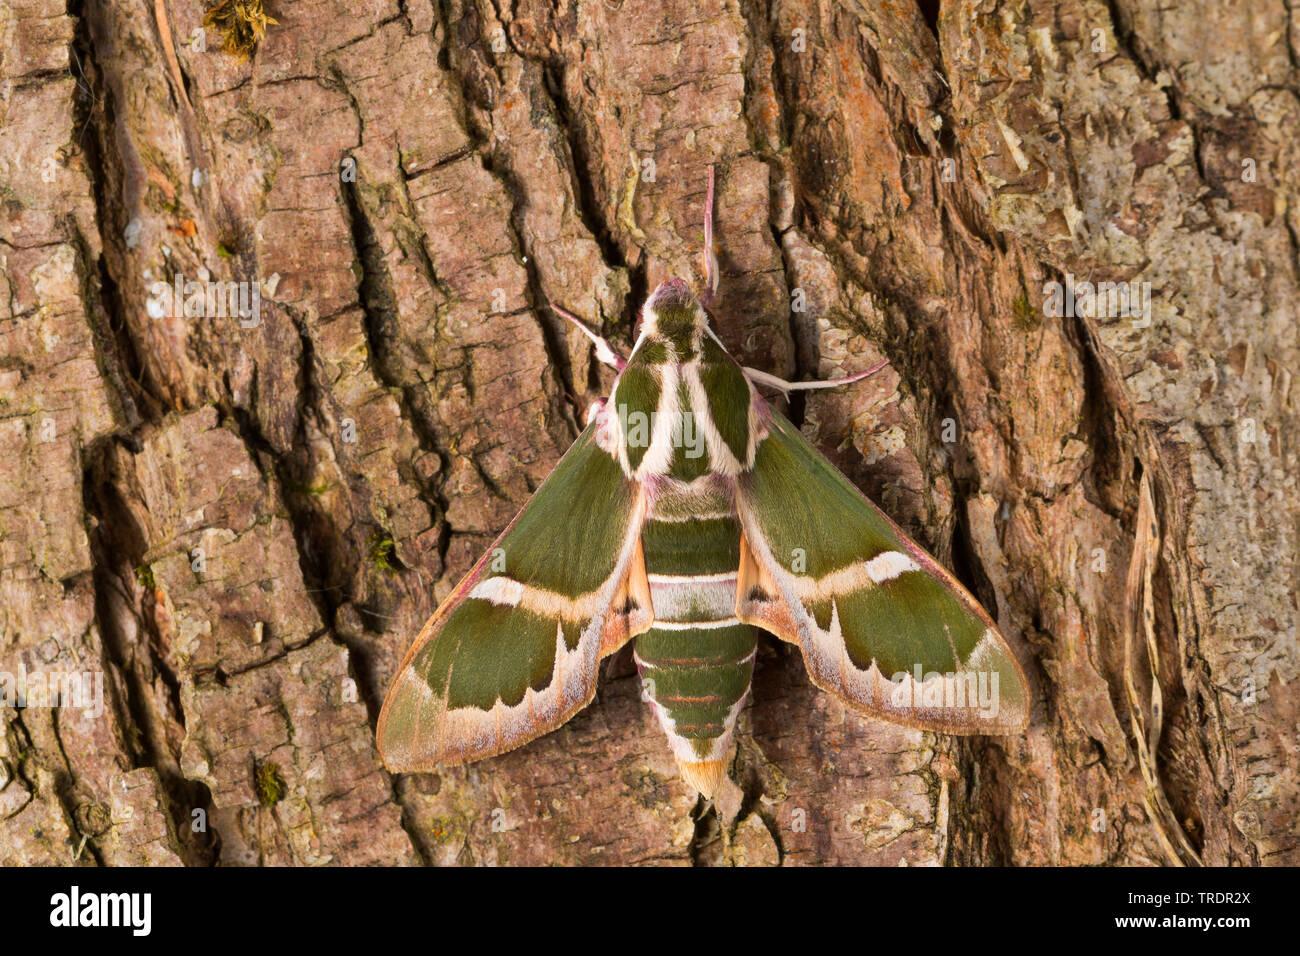 Schwaermer, Rethera komarovi (Rethera komarovi), sitzt auf Borke, Deutschland | Schwaermer-Rethera-komarovi (Rethera komarovi), on bark, Germany | BLW - Stock Image